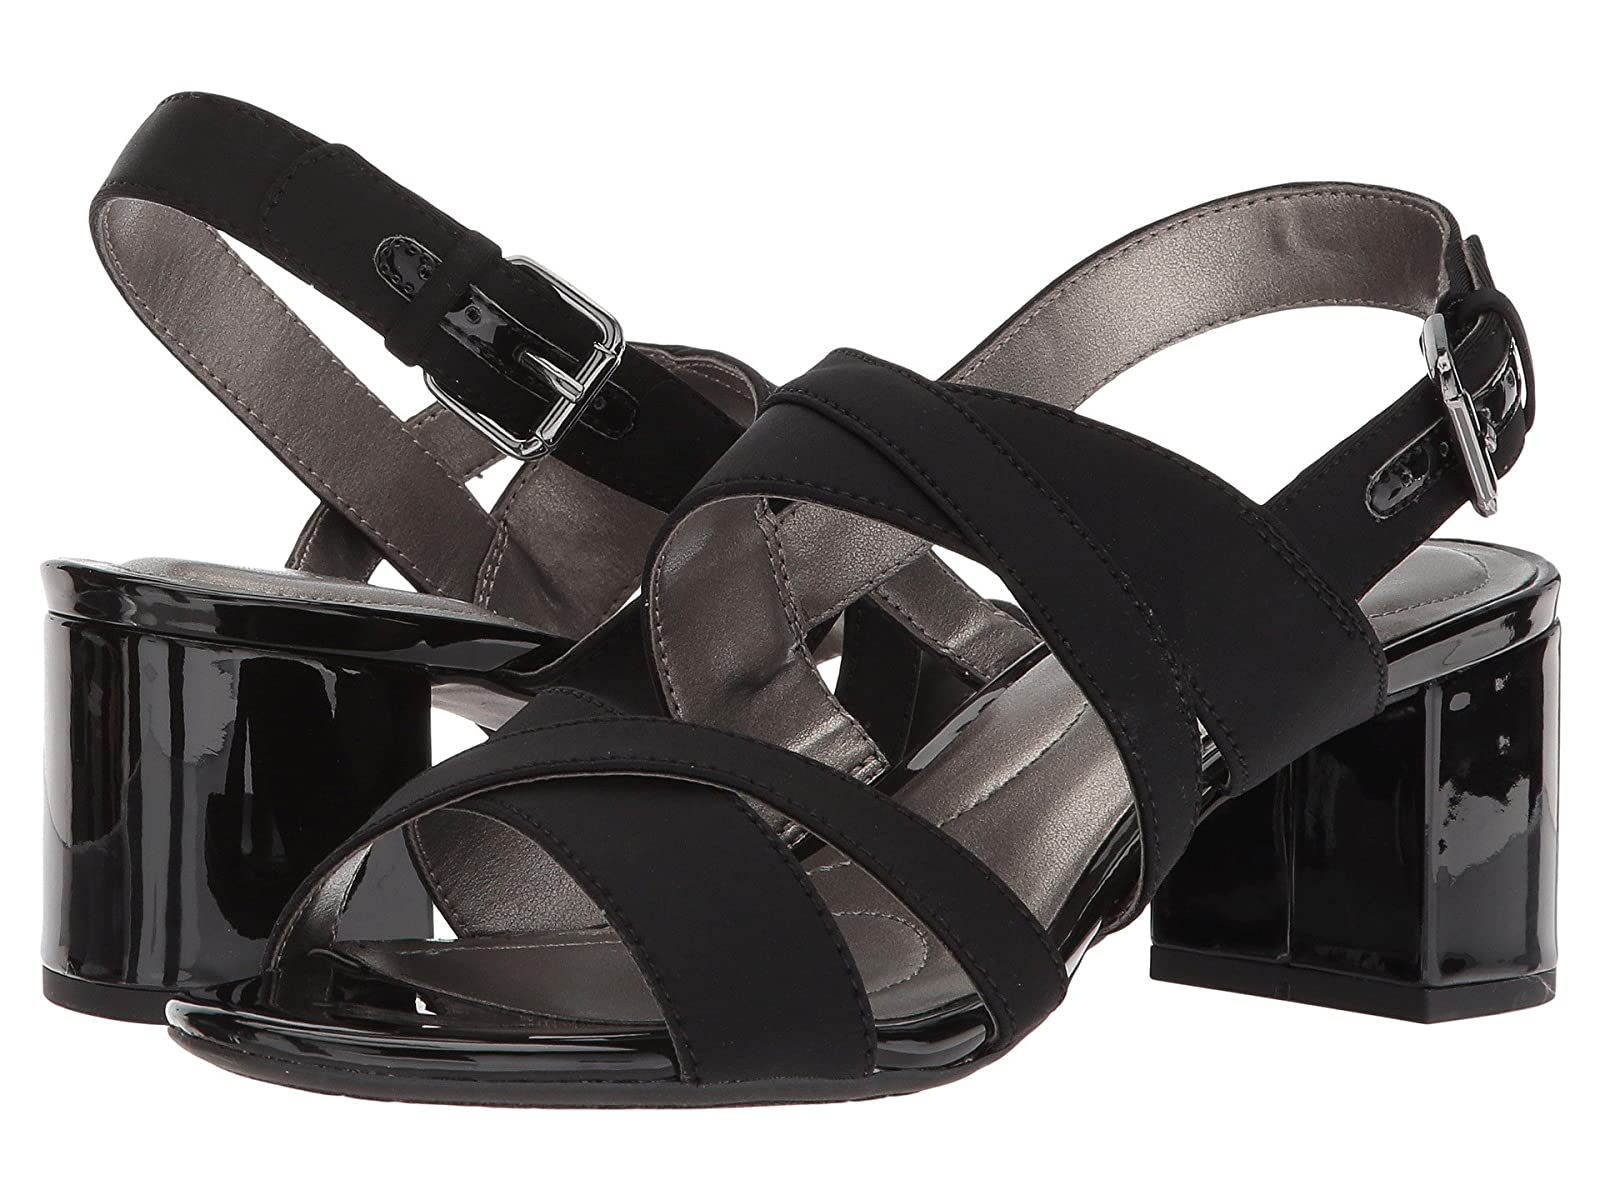 Bandolino StepaAtmospheric grades have affordable shoes